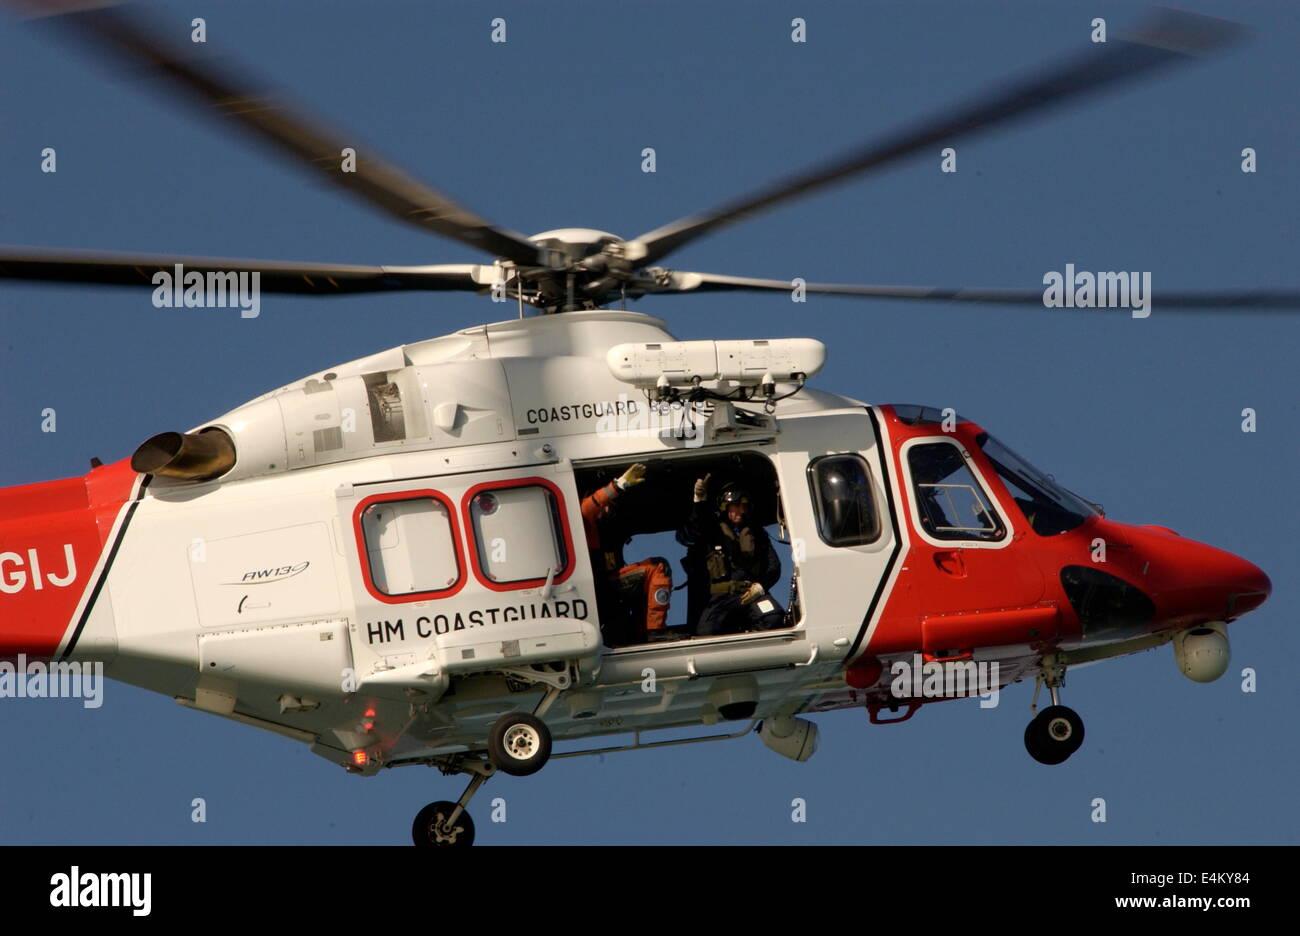 Elicottero 139 : Solent inghilterra airborne h.m. i guardacoste lynx elicottero aw